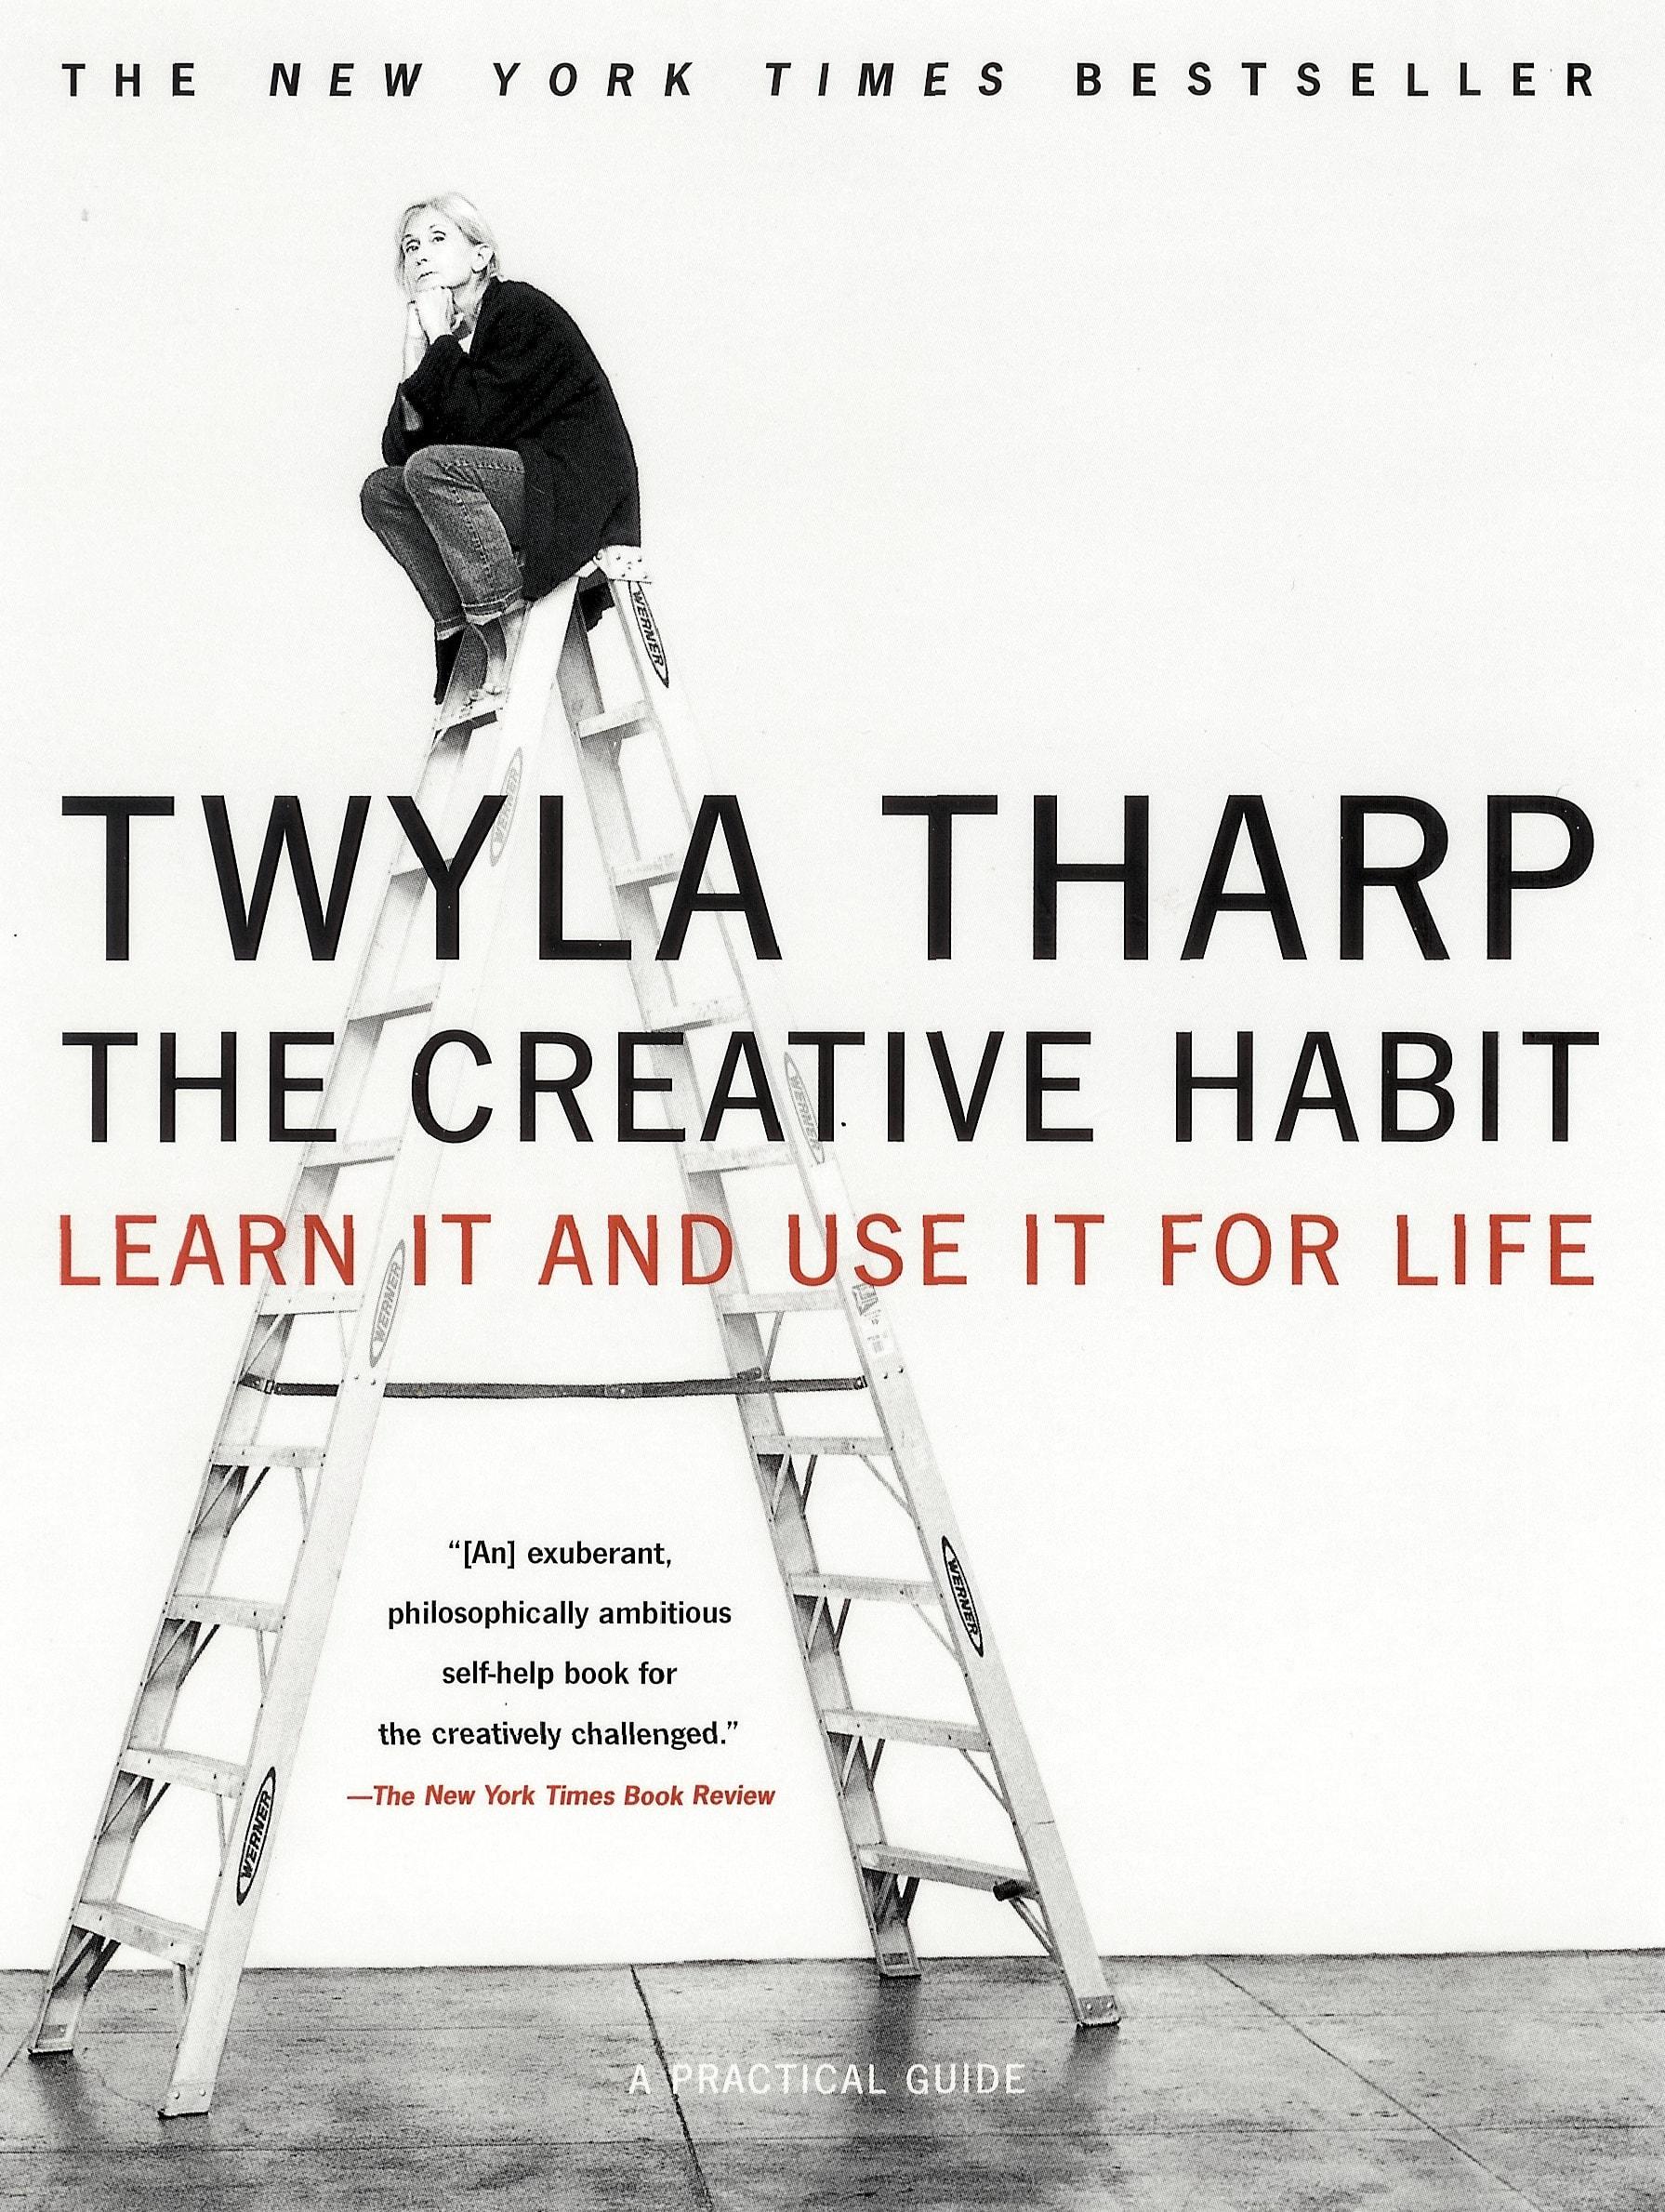 The Creative Habit – Twyla Tharp